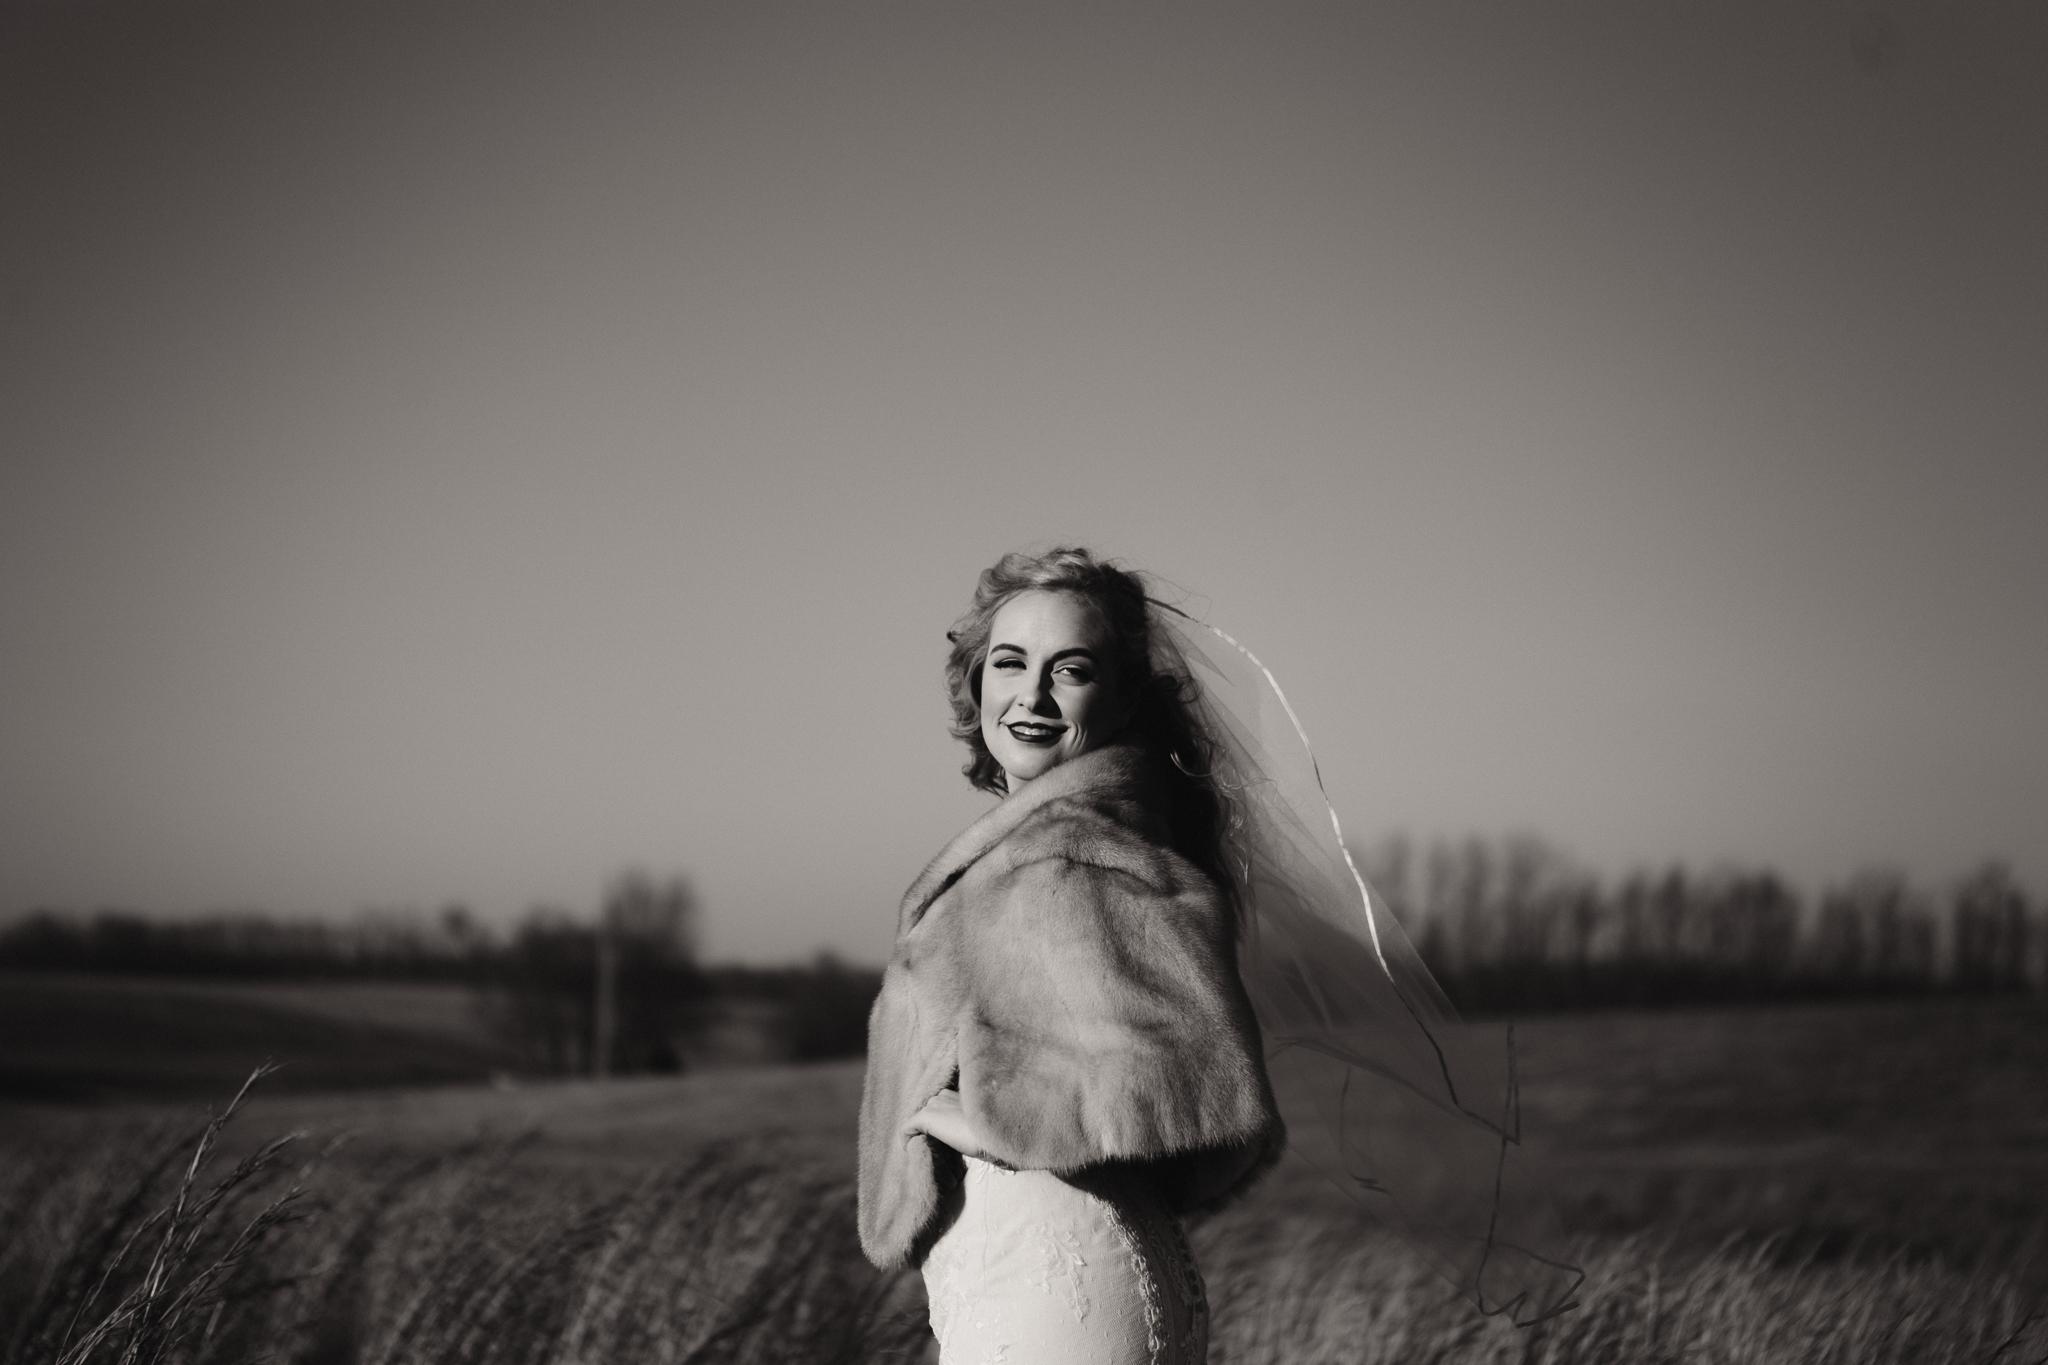 0079 Ariana Jordan Photo - Cameron & Lauren's Wedding at Talon Winery _.jpg